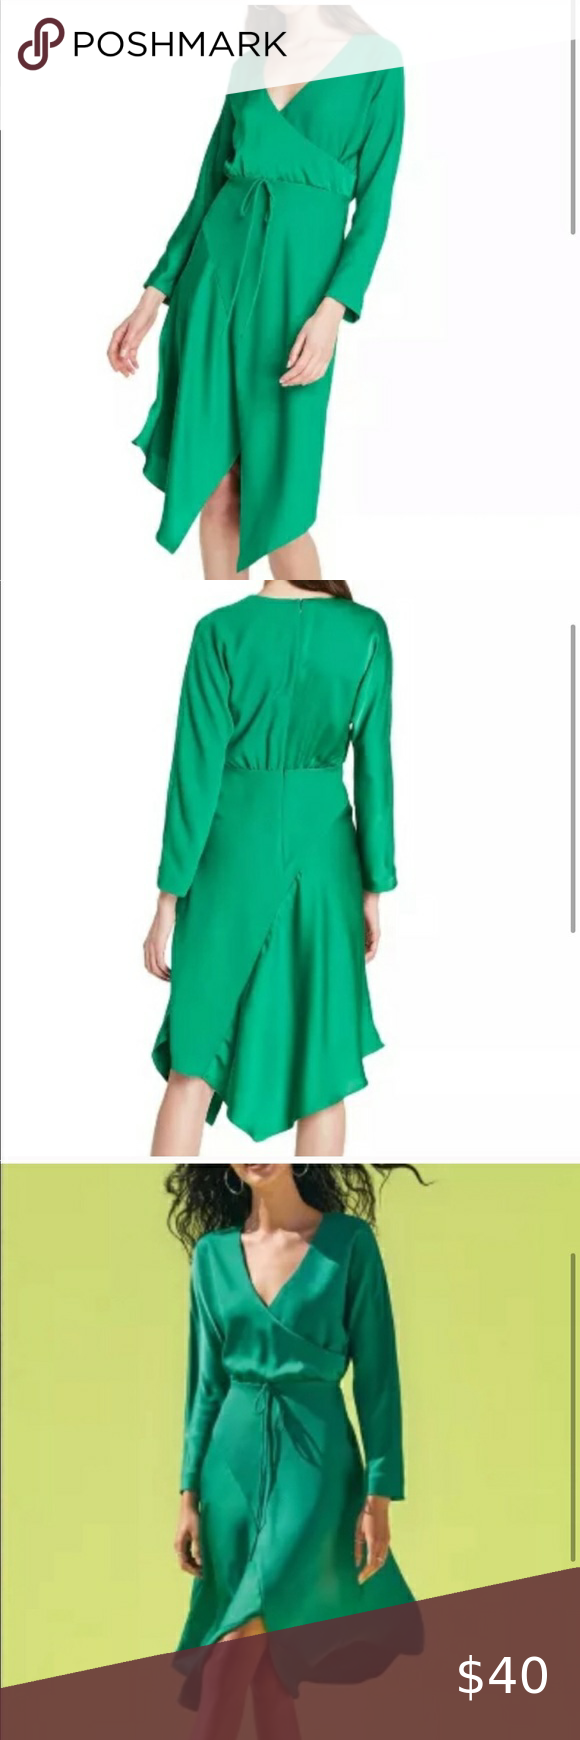 Nwt Cushnie X Target Green Wrap Dress Green Wrap Dress Wrap Dress Dresses [ 1740 x 580 Pixel ]